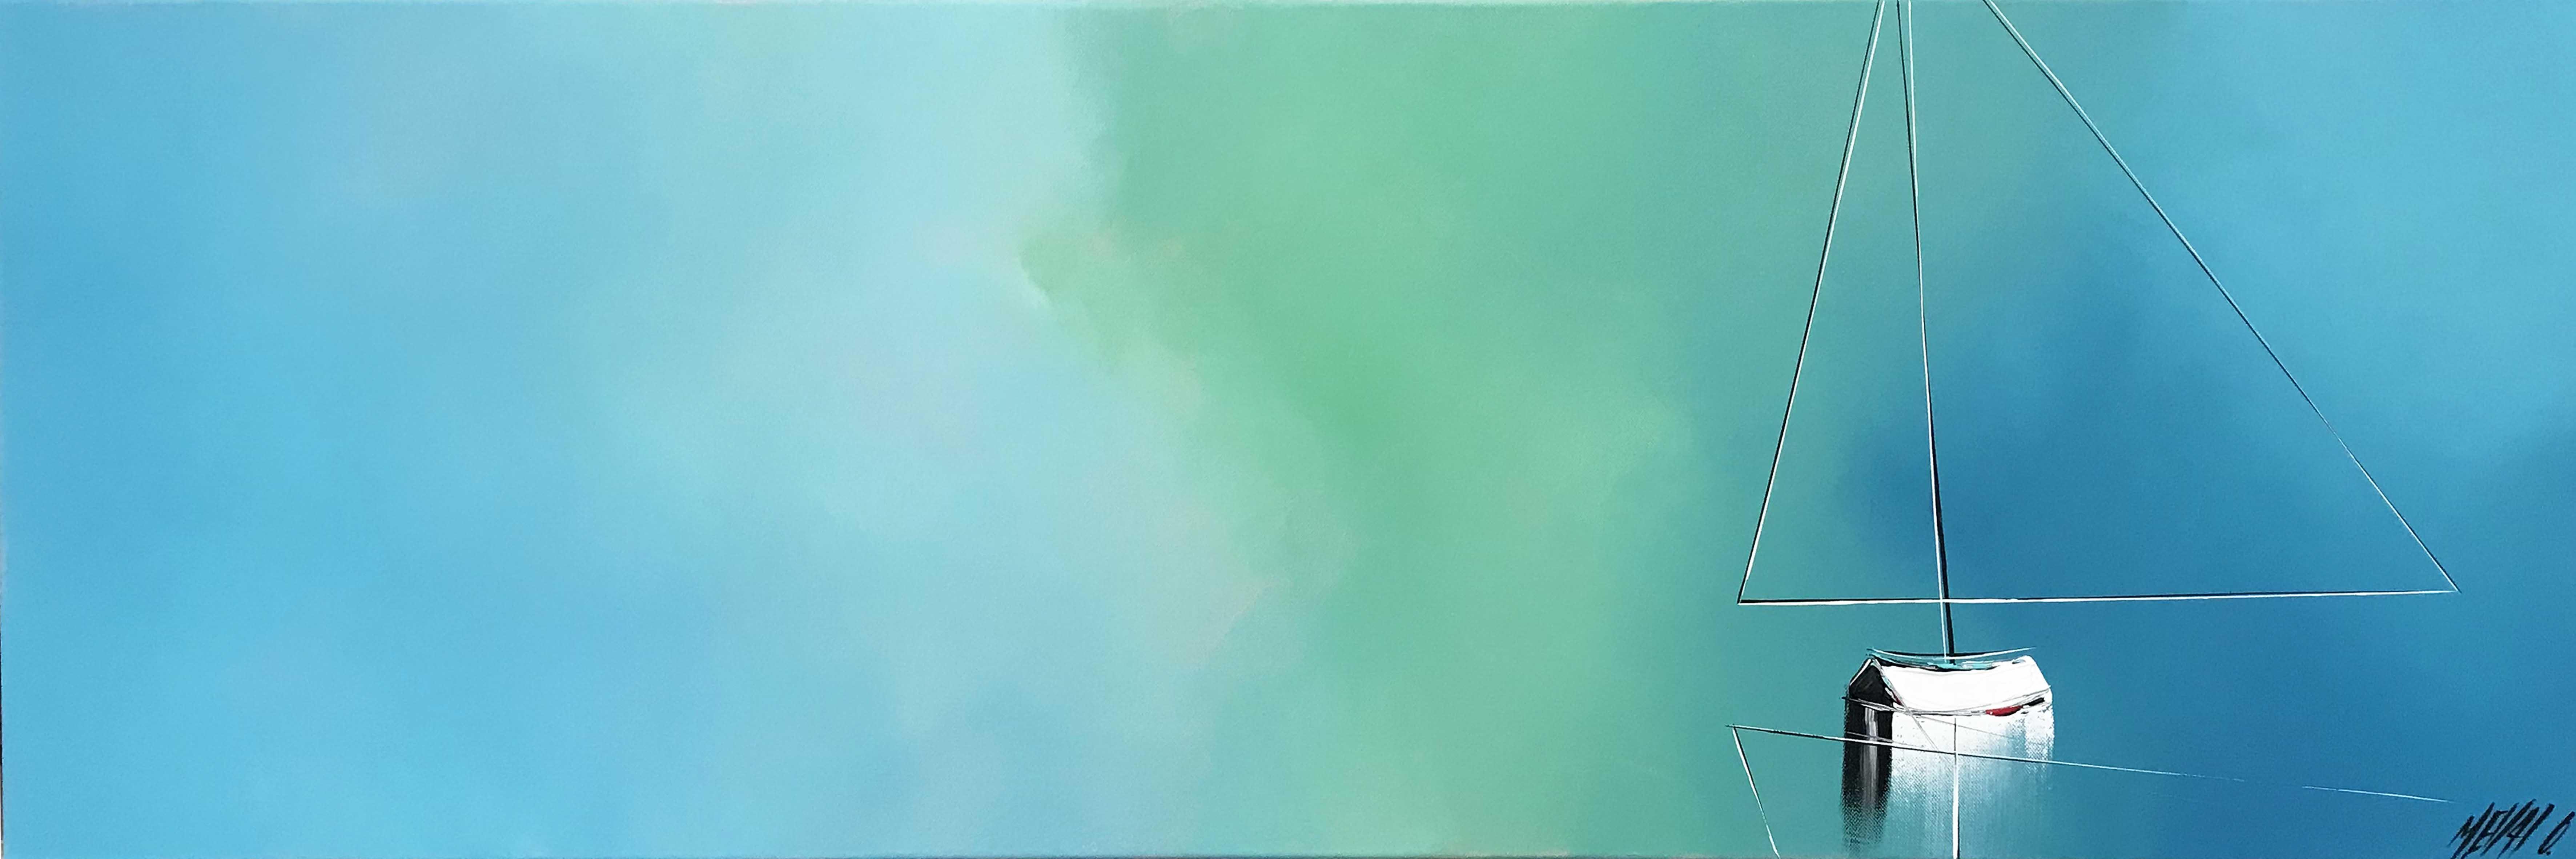 Sérénité en mer... 40x120cm